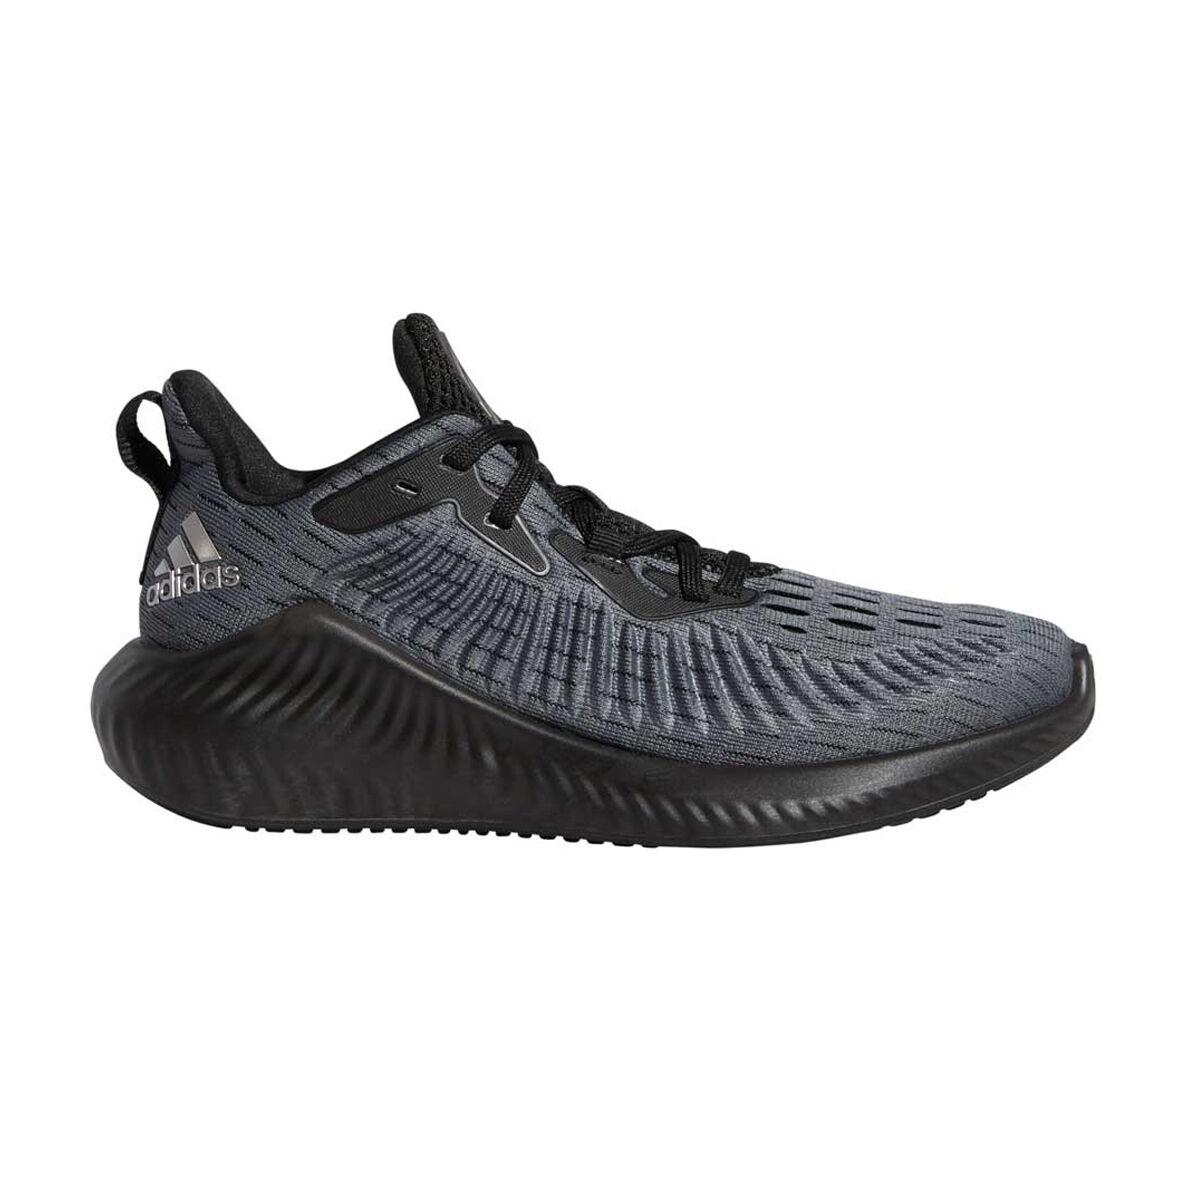 adidas Alphabounce Kids Running Shoes